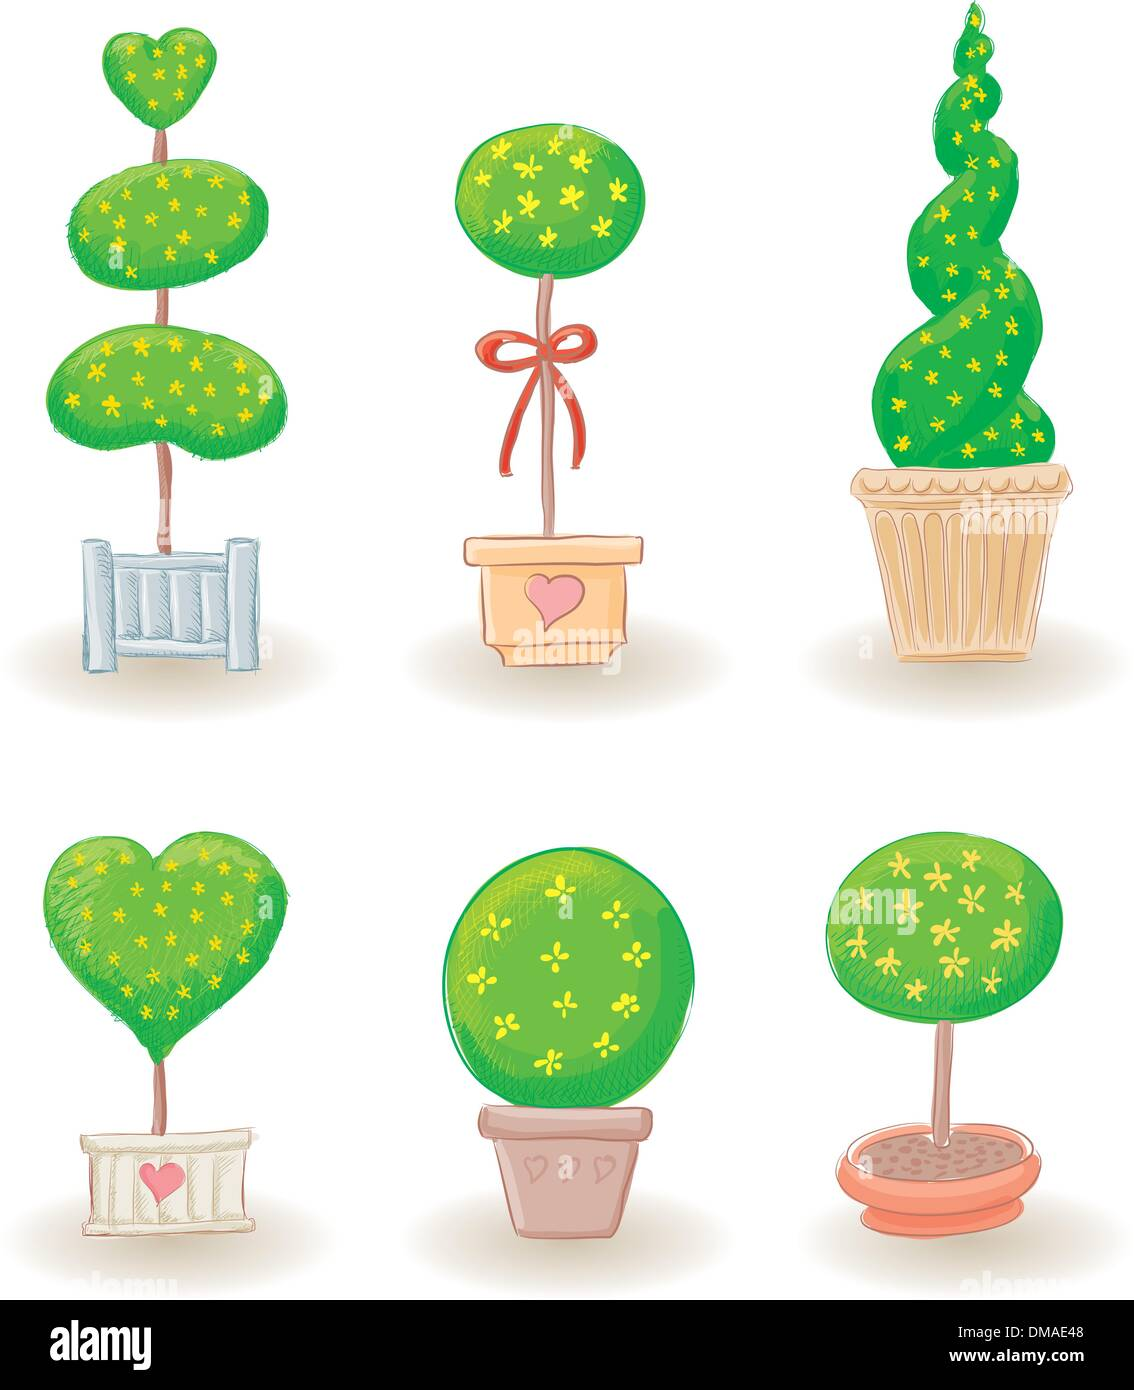 Garden Trees   Set 2   Stock Image